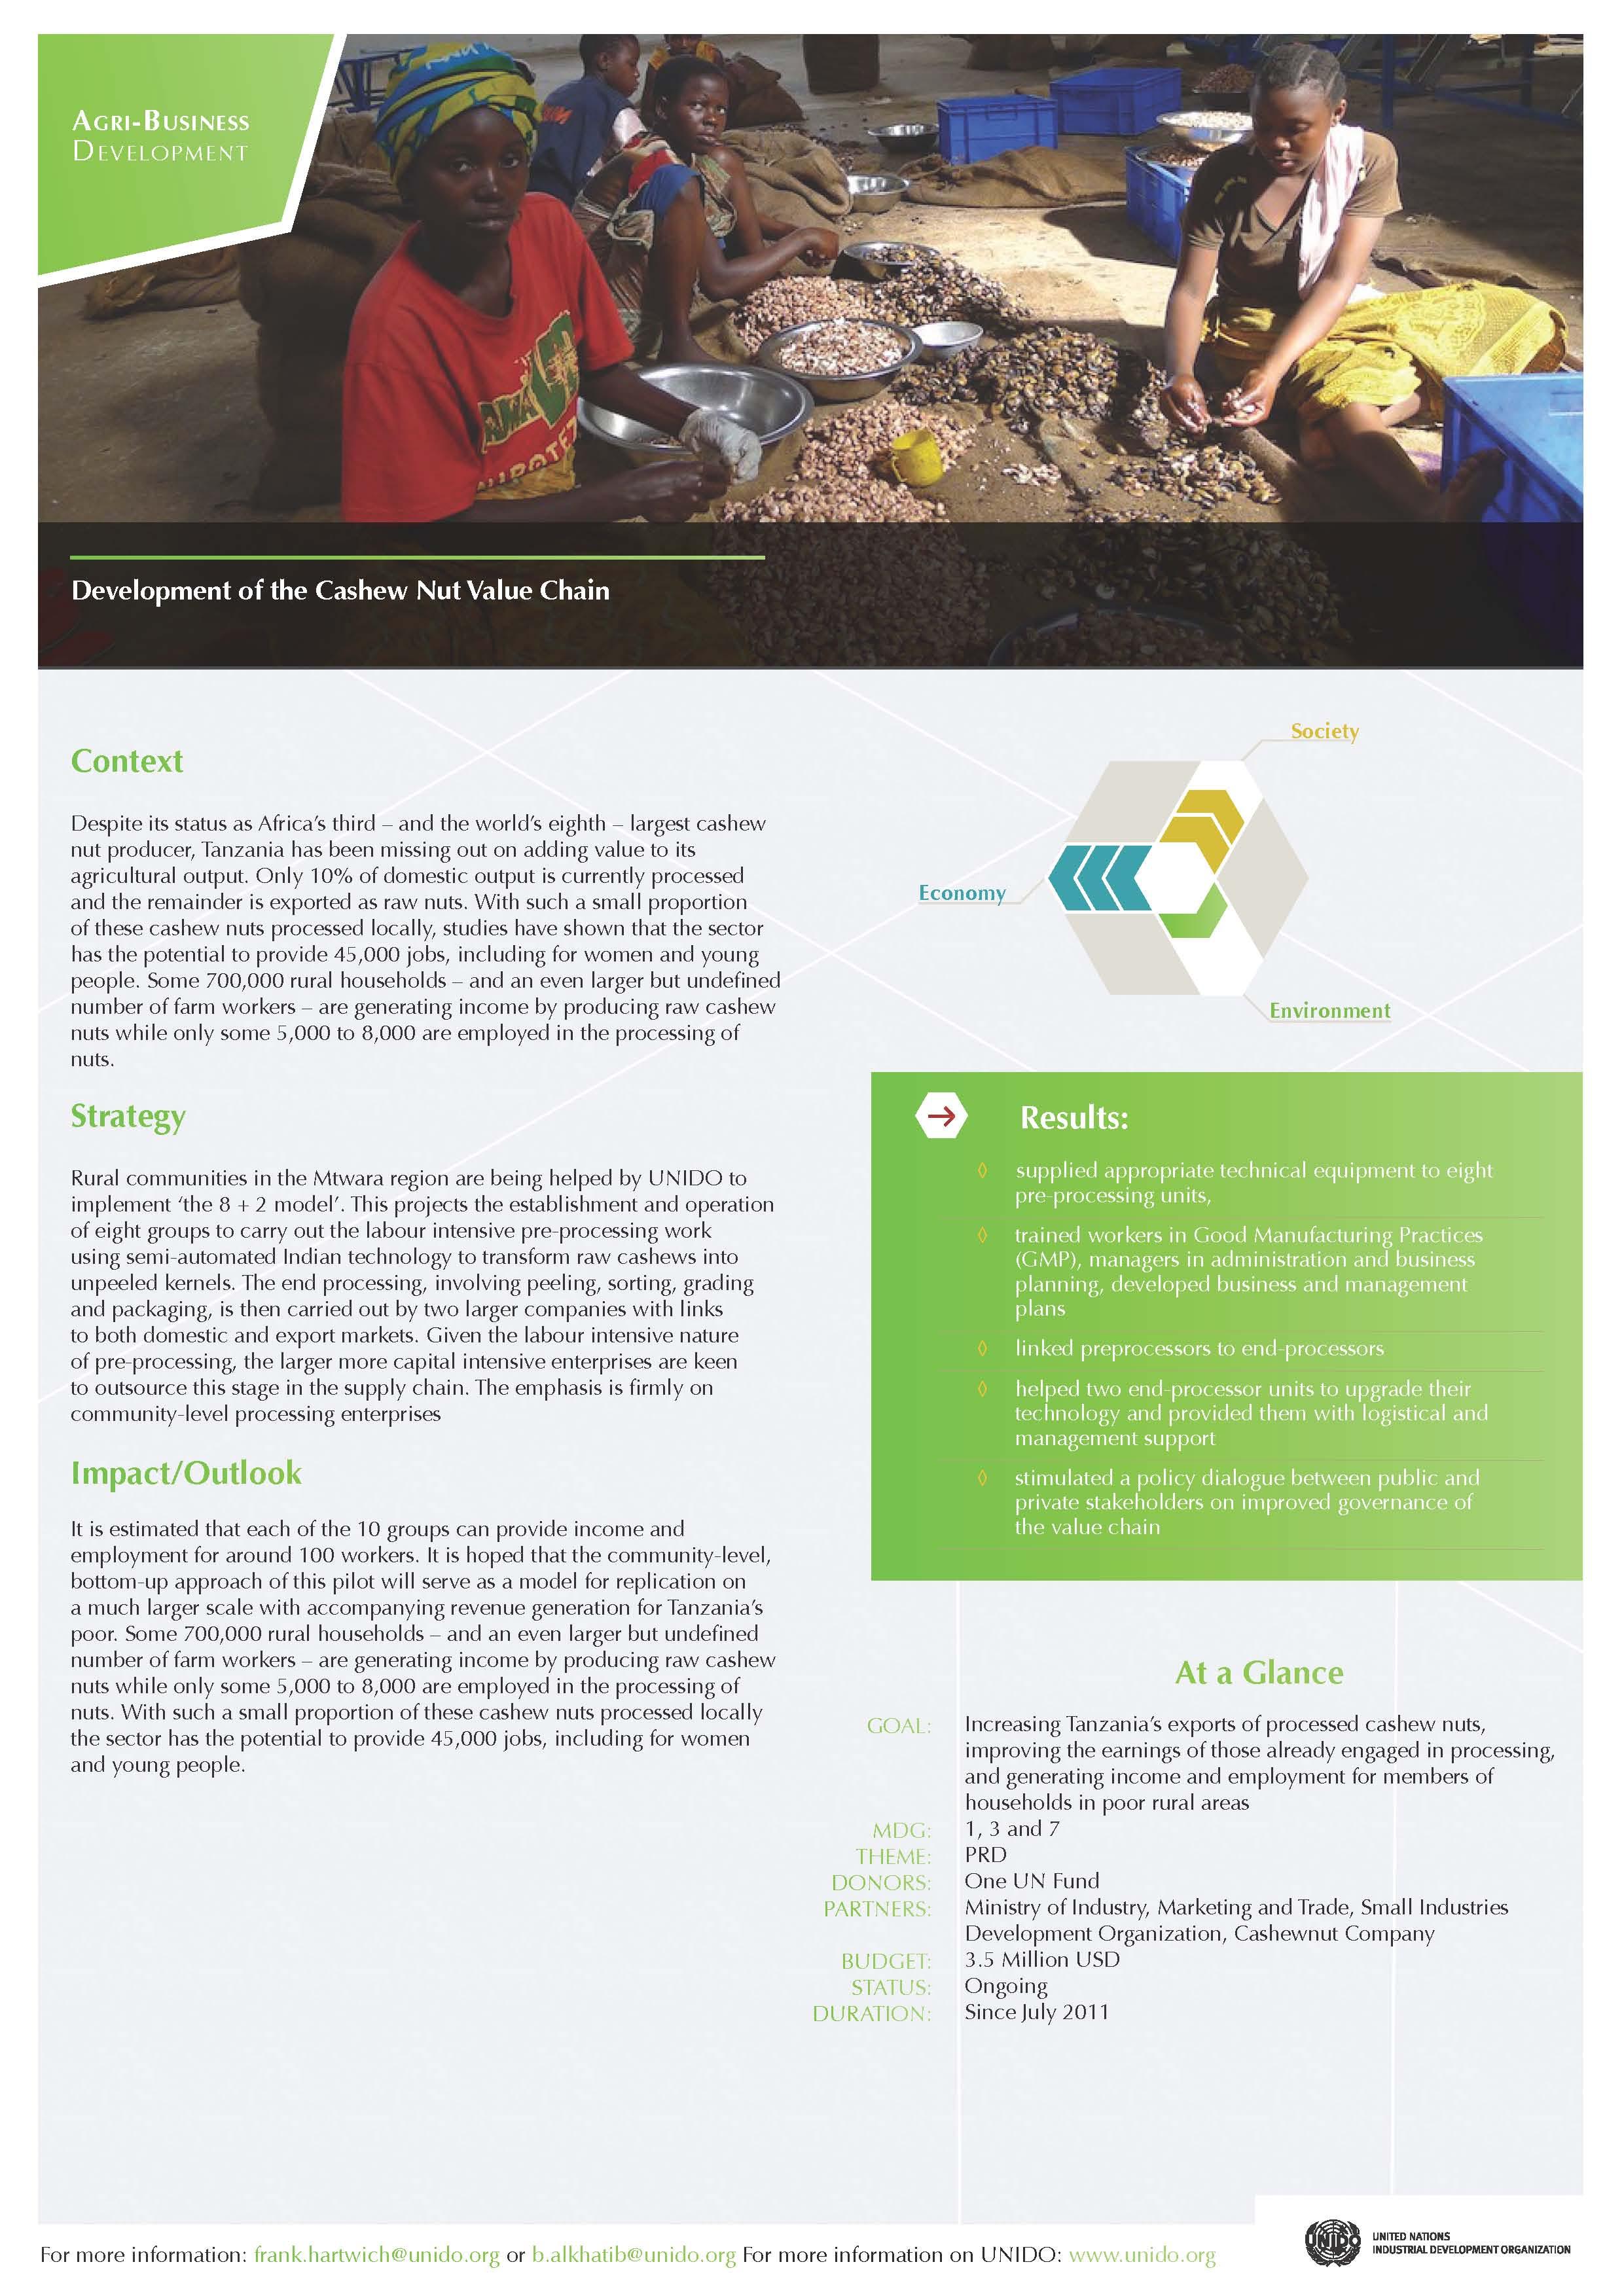 brief history of mozambique pdf